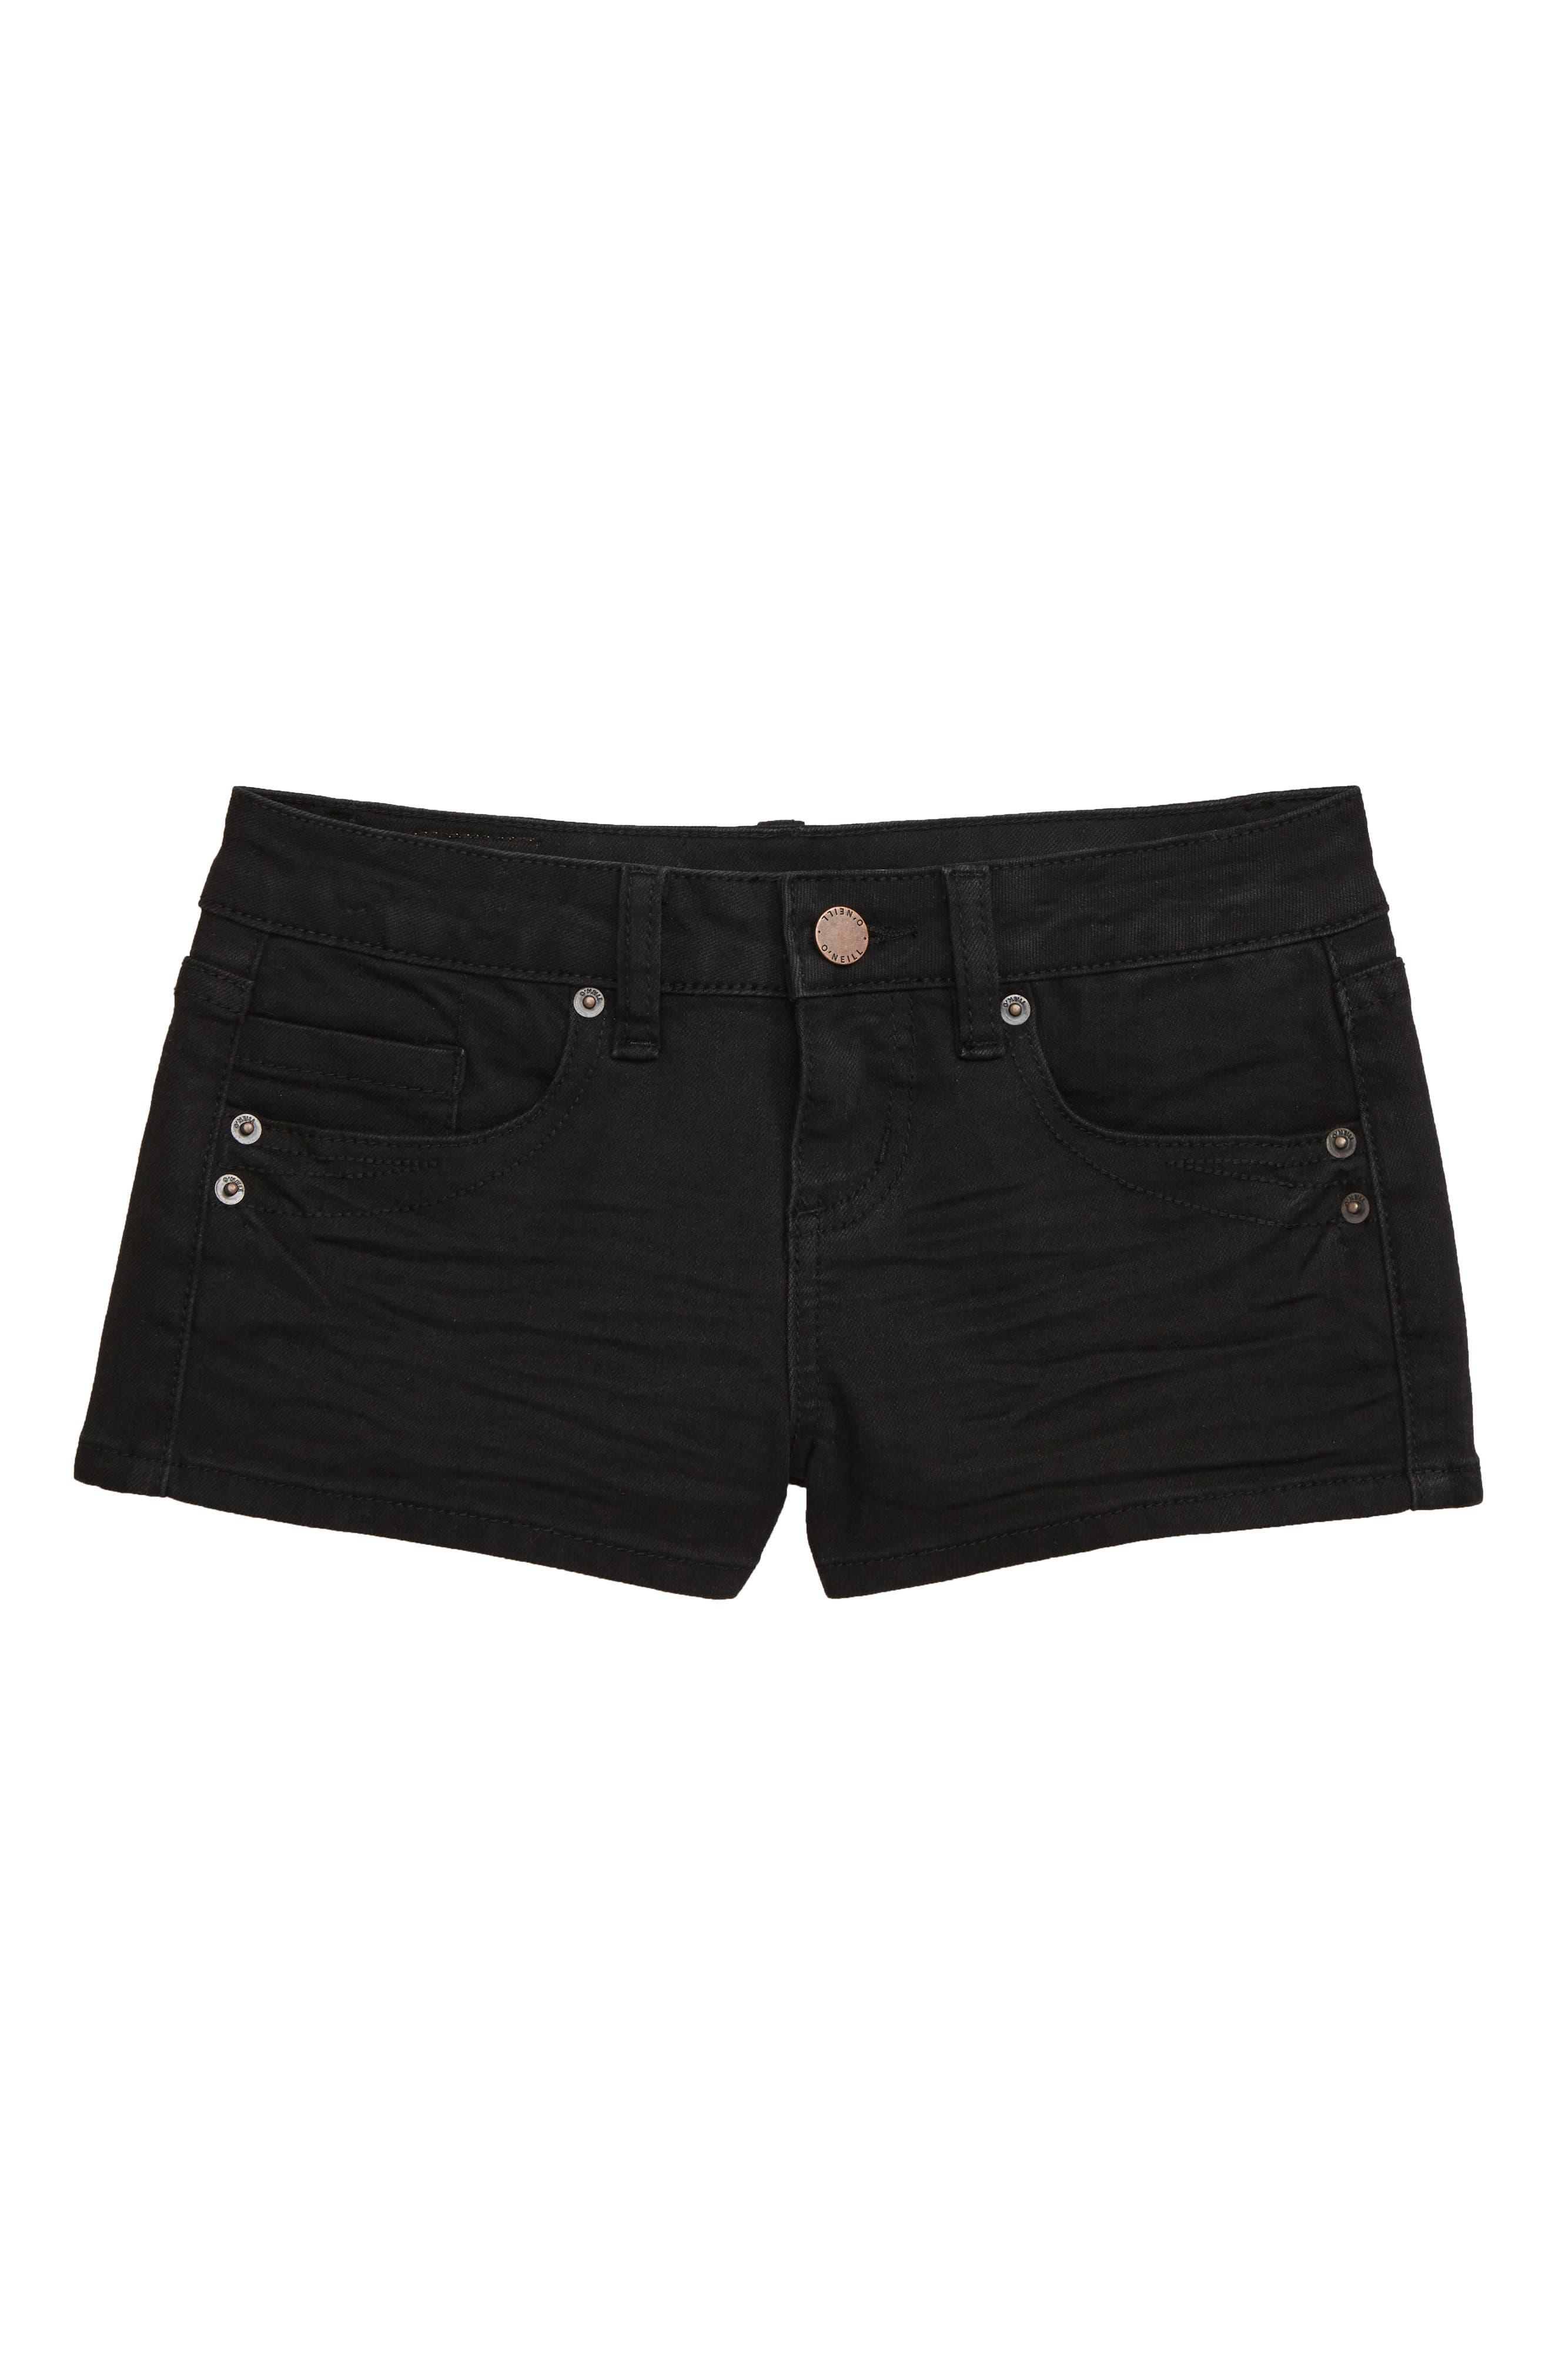 Girls ONeill Waidley 2 Denim Shorts Size 12  Black